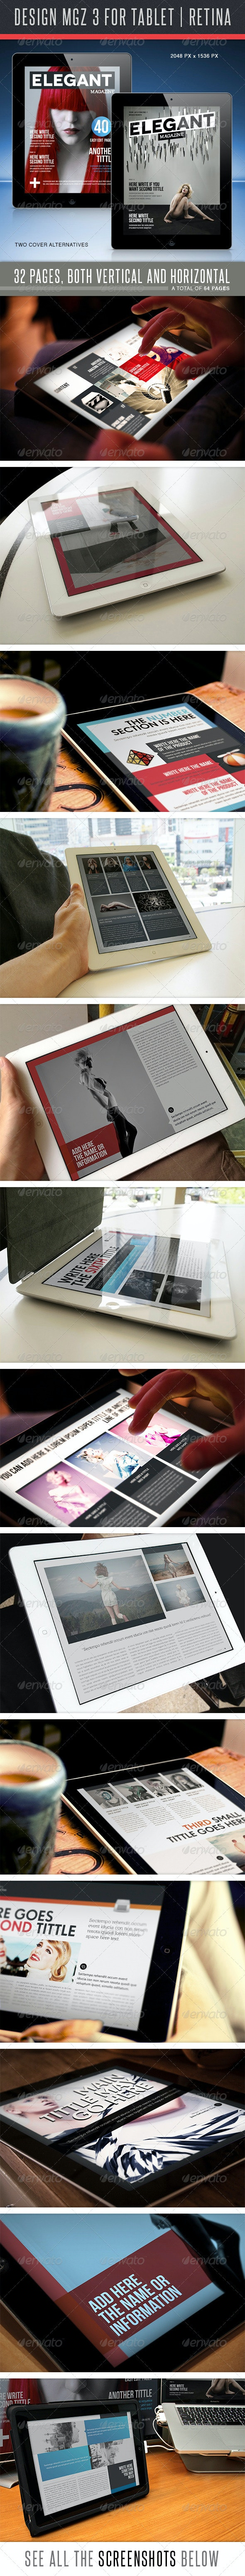 Design MGZ 3 for Tablet - Digital Magazines ePublishing